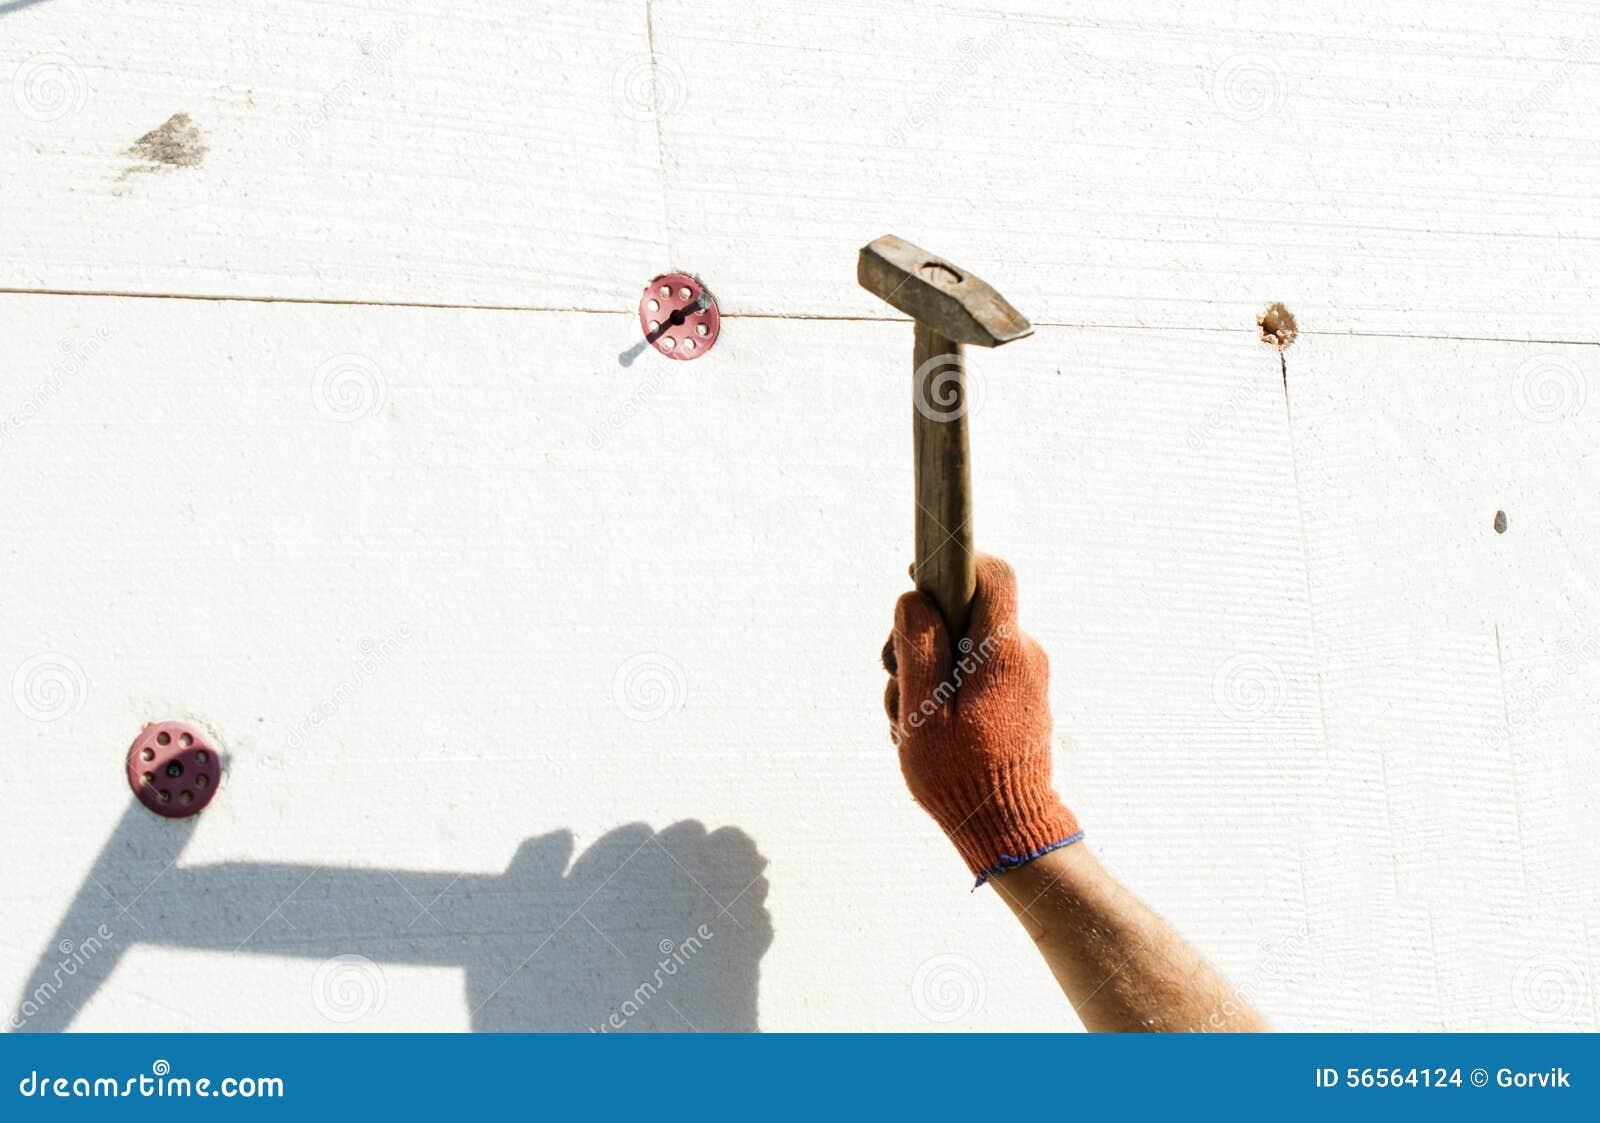 Download Η διαδικασία Tusing ένα σφυρί μετάλλων Στοκ Εικόνες - εικόνα από μέταλλο, πλάνο: 56564124